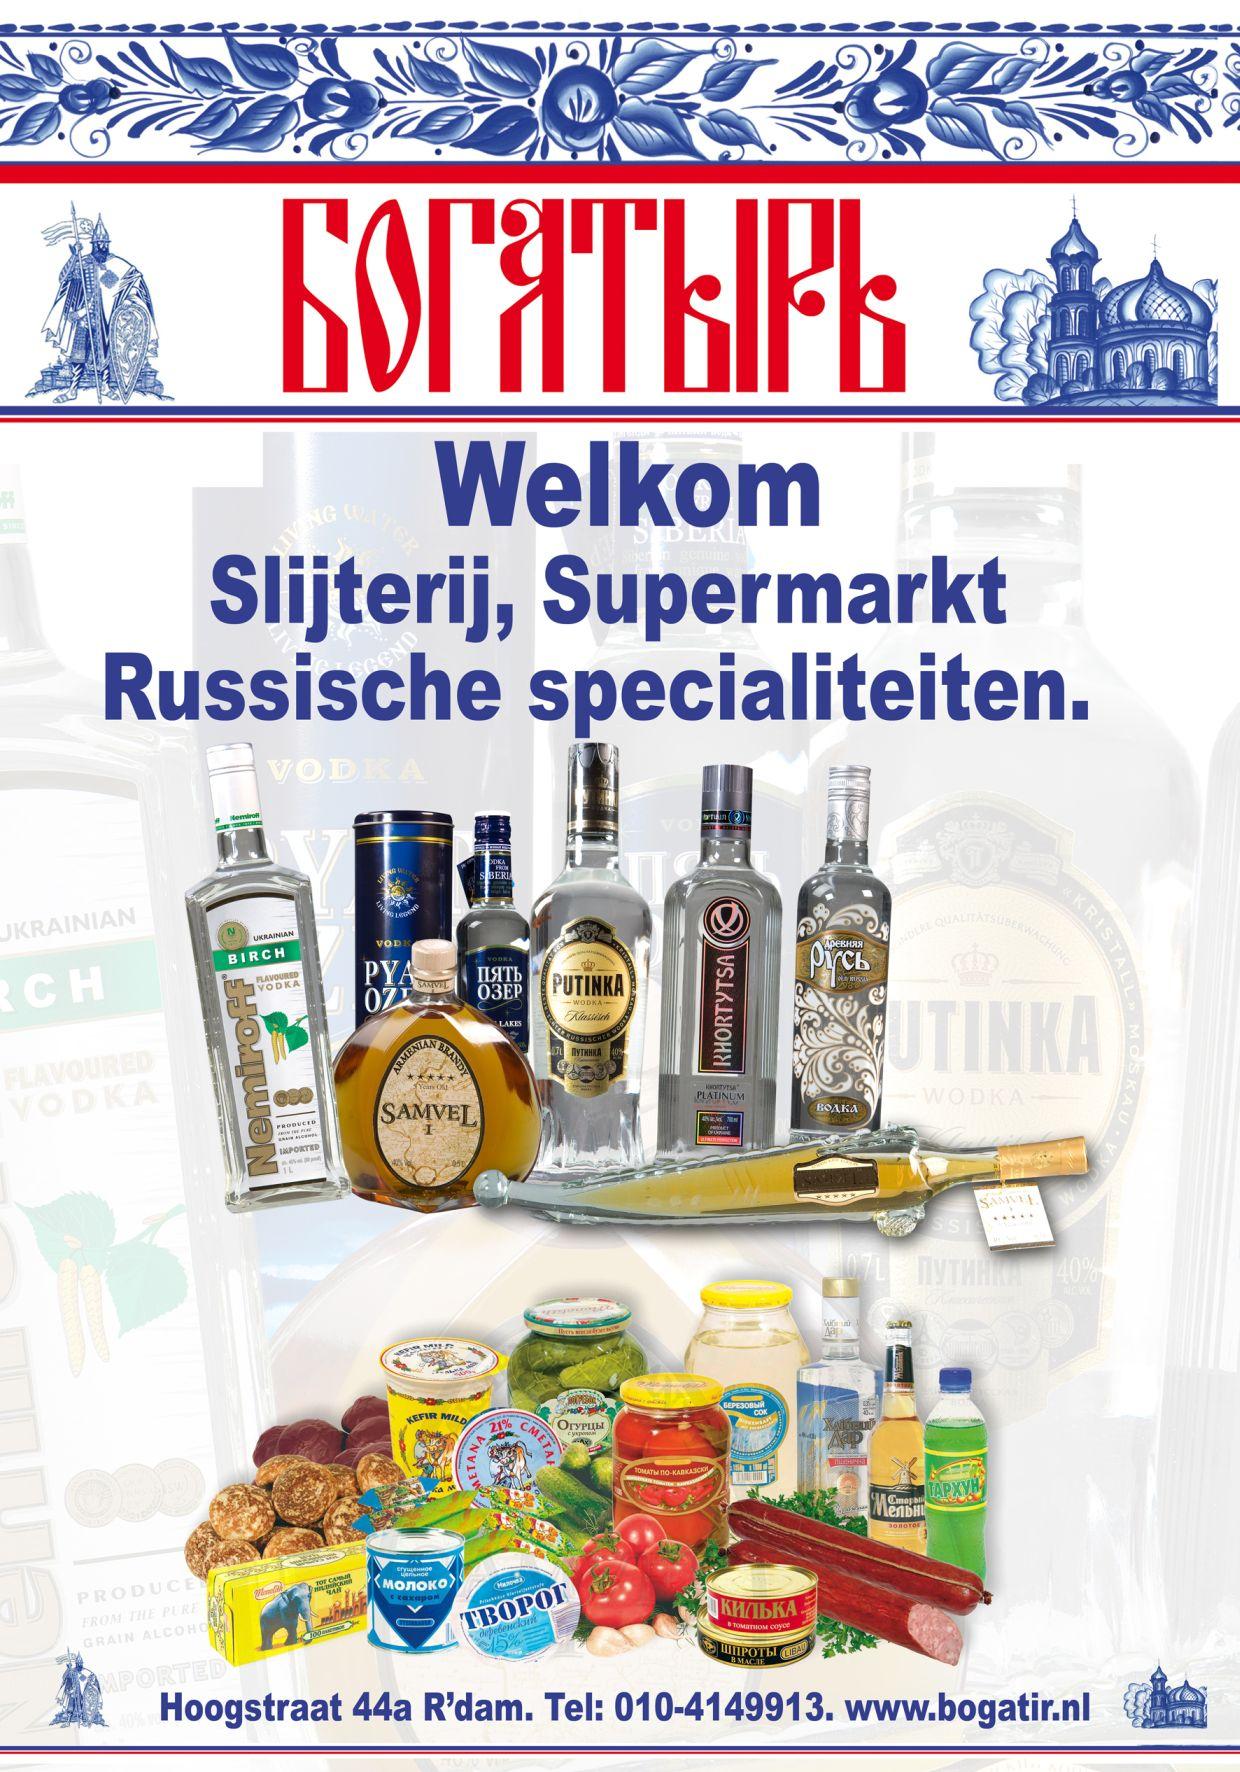 Russian-shop-Bogatir-in-Rotterdam